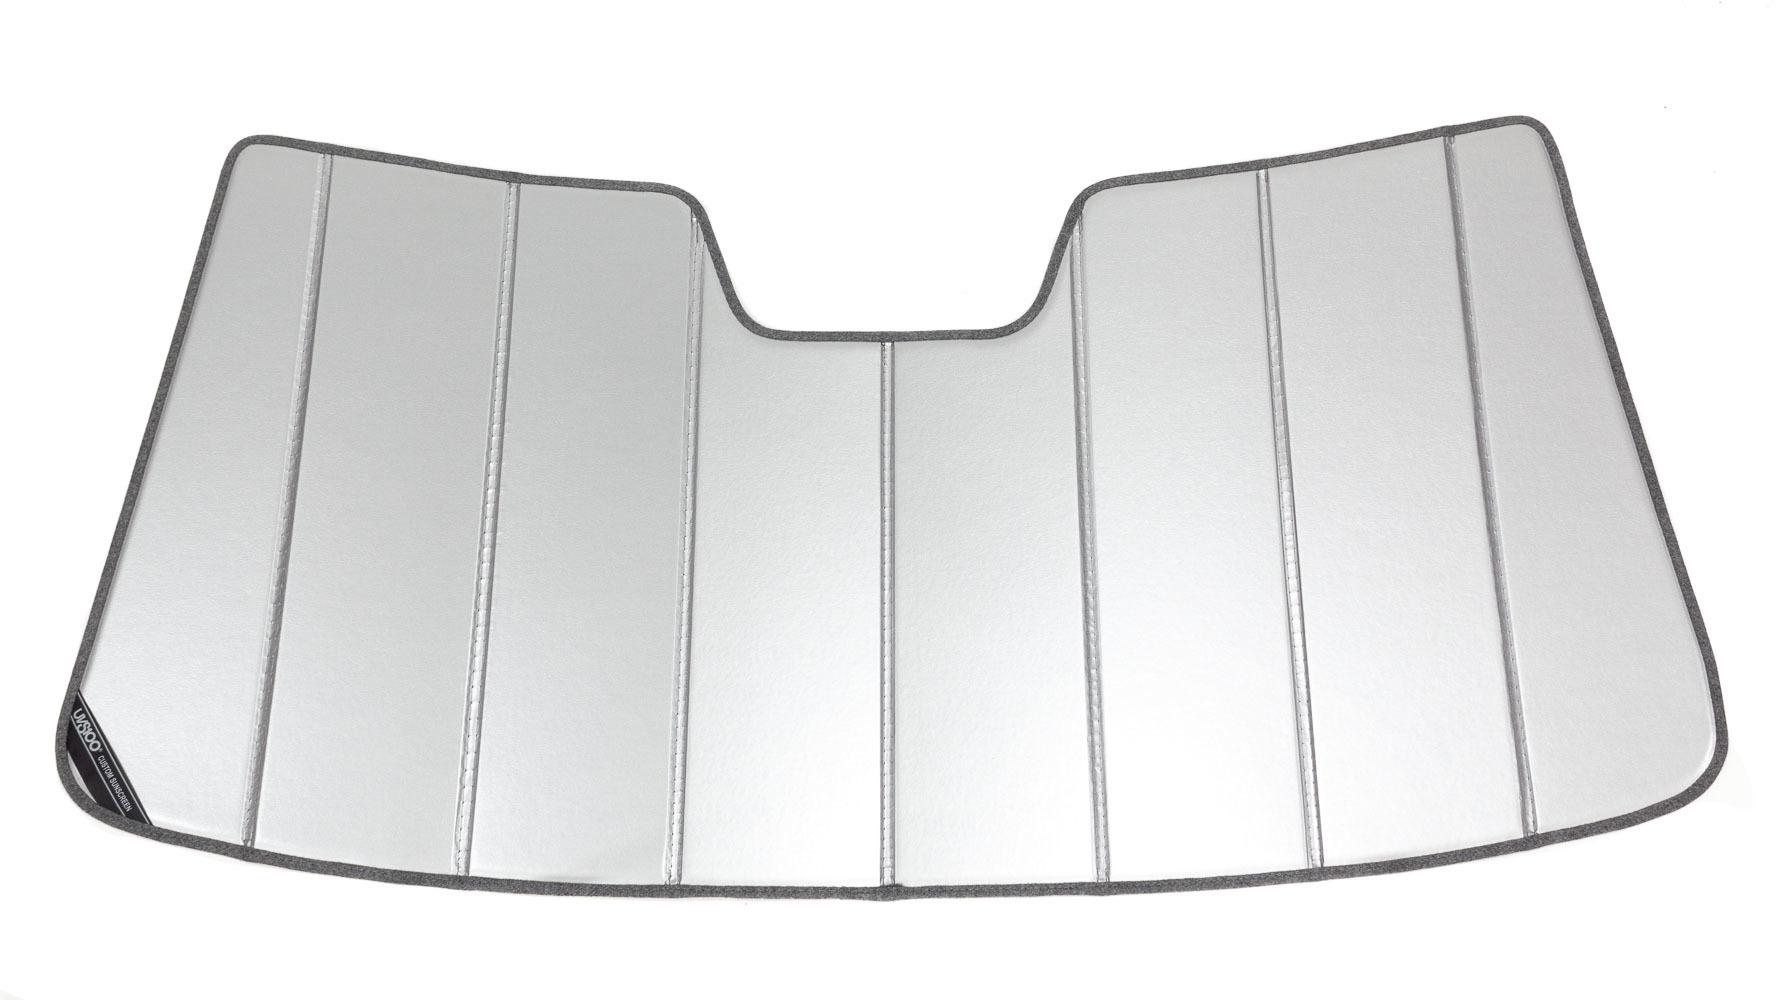 Covercraft Interior Window Cover 09-15 Dodge Ram Silver